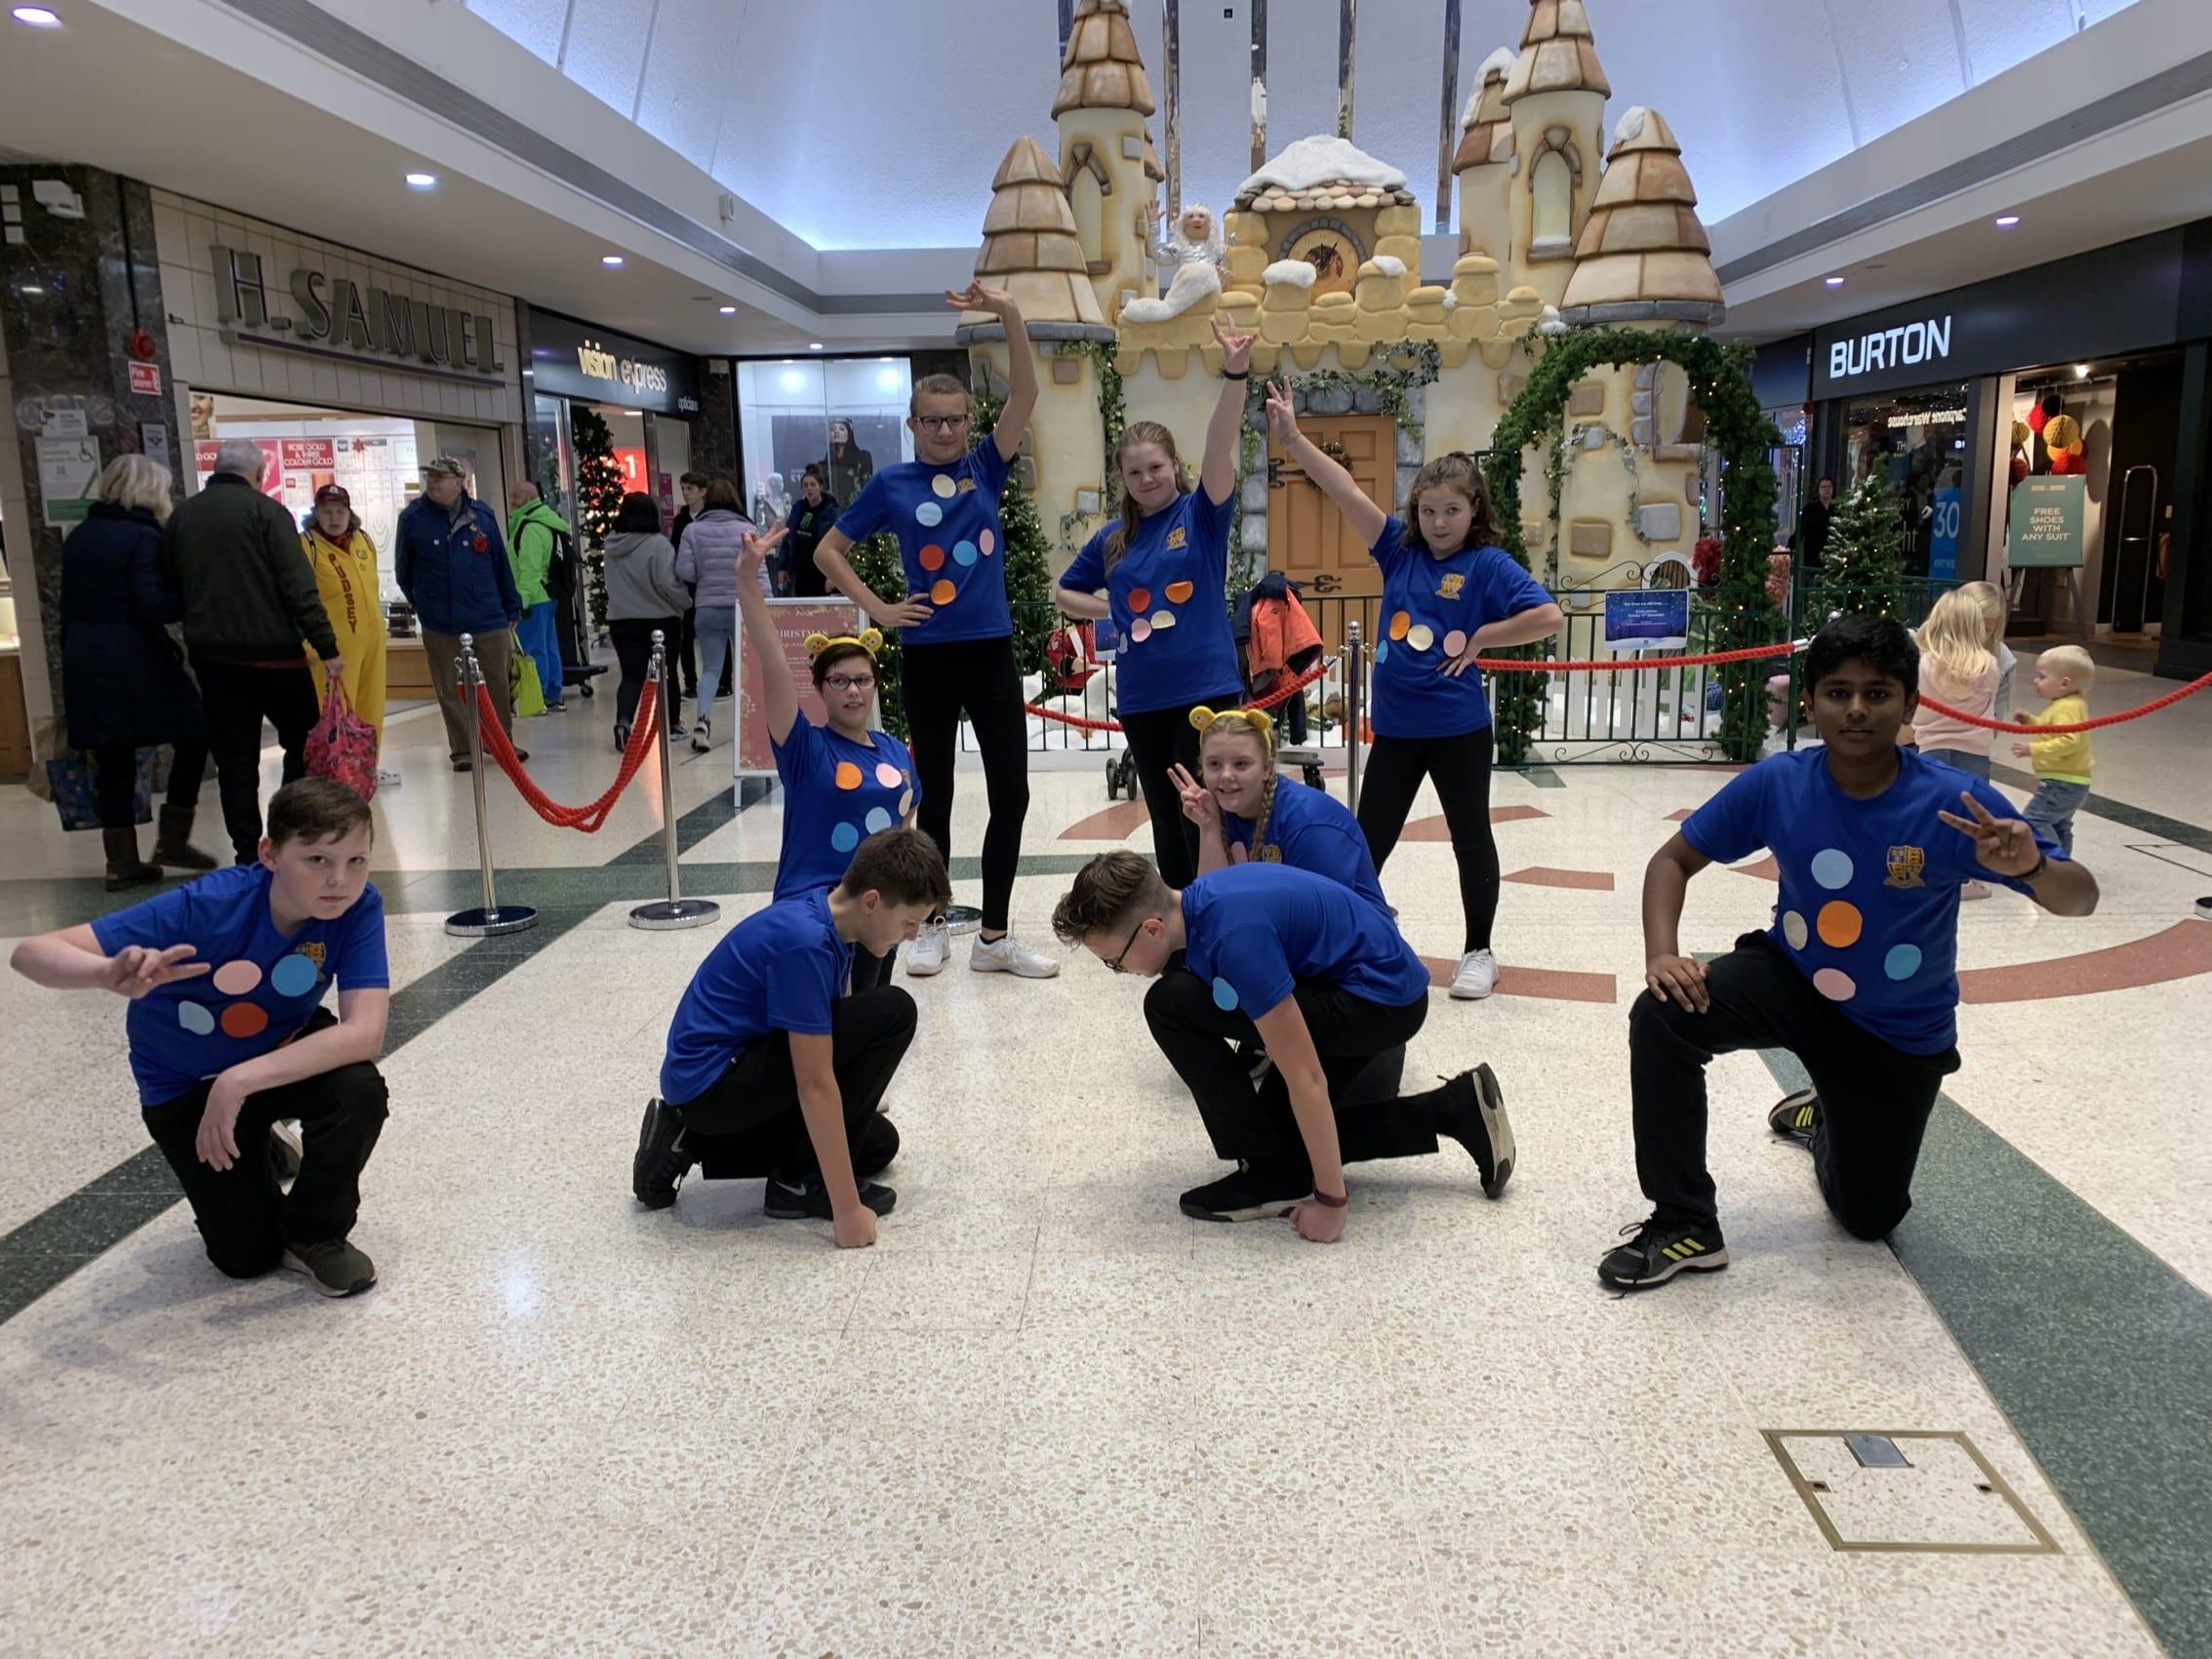 'Dance Dash' for BBC Children in Need